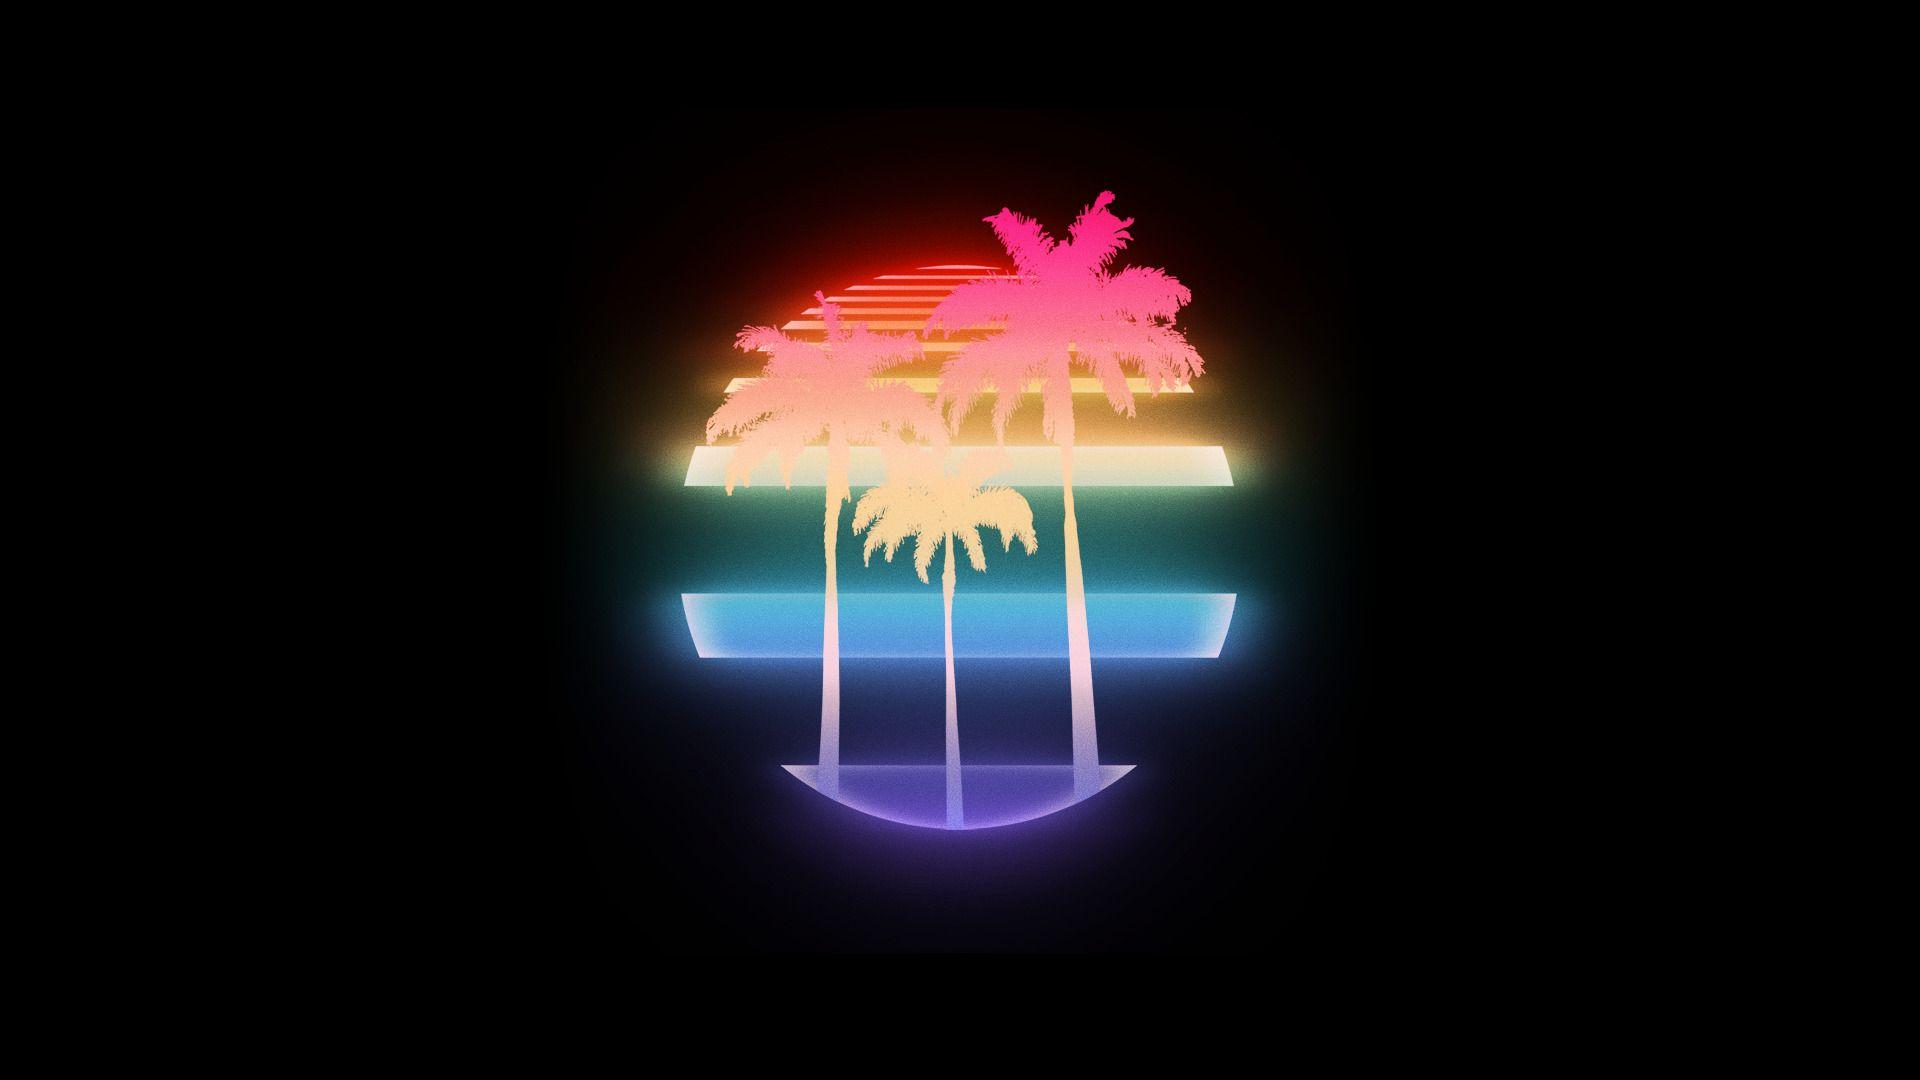 VHS Palm trees 1980s New Retro Wave Retro style Vintage 1920x1080